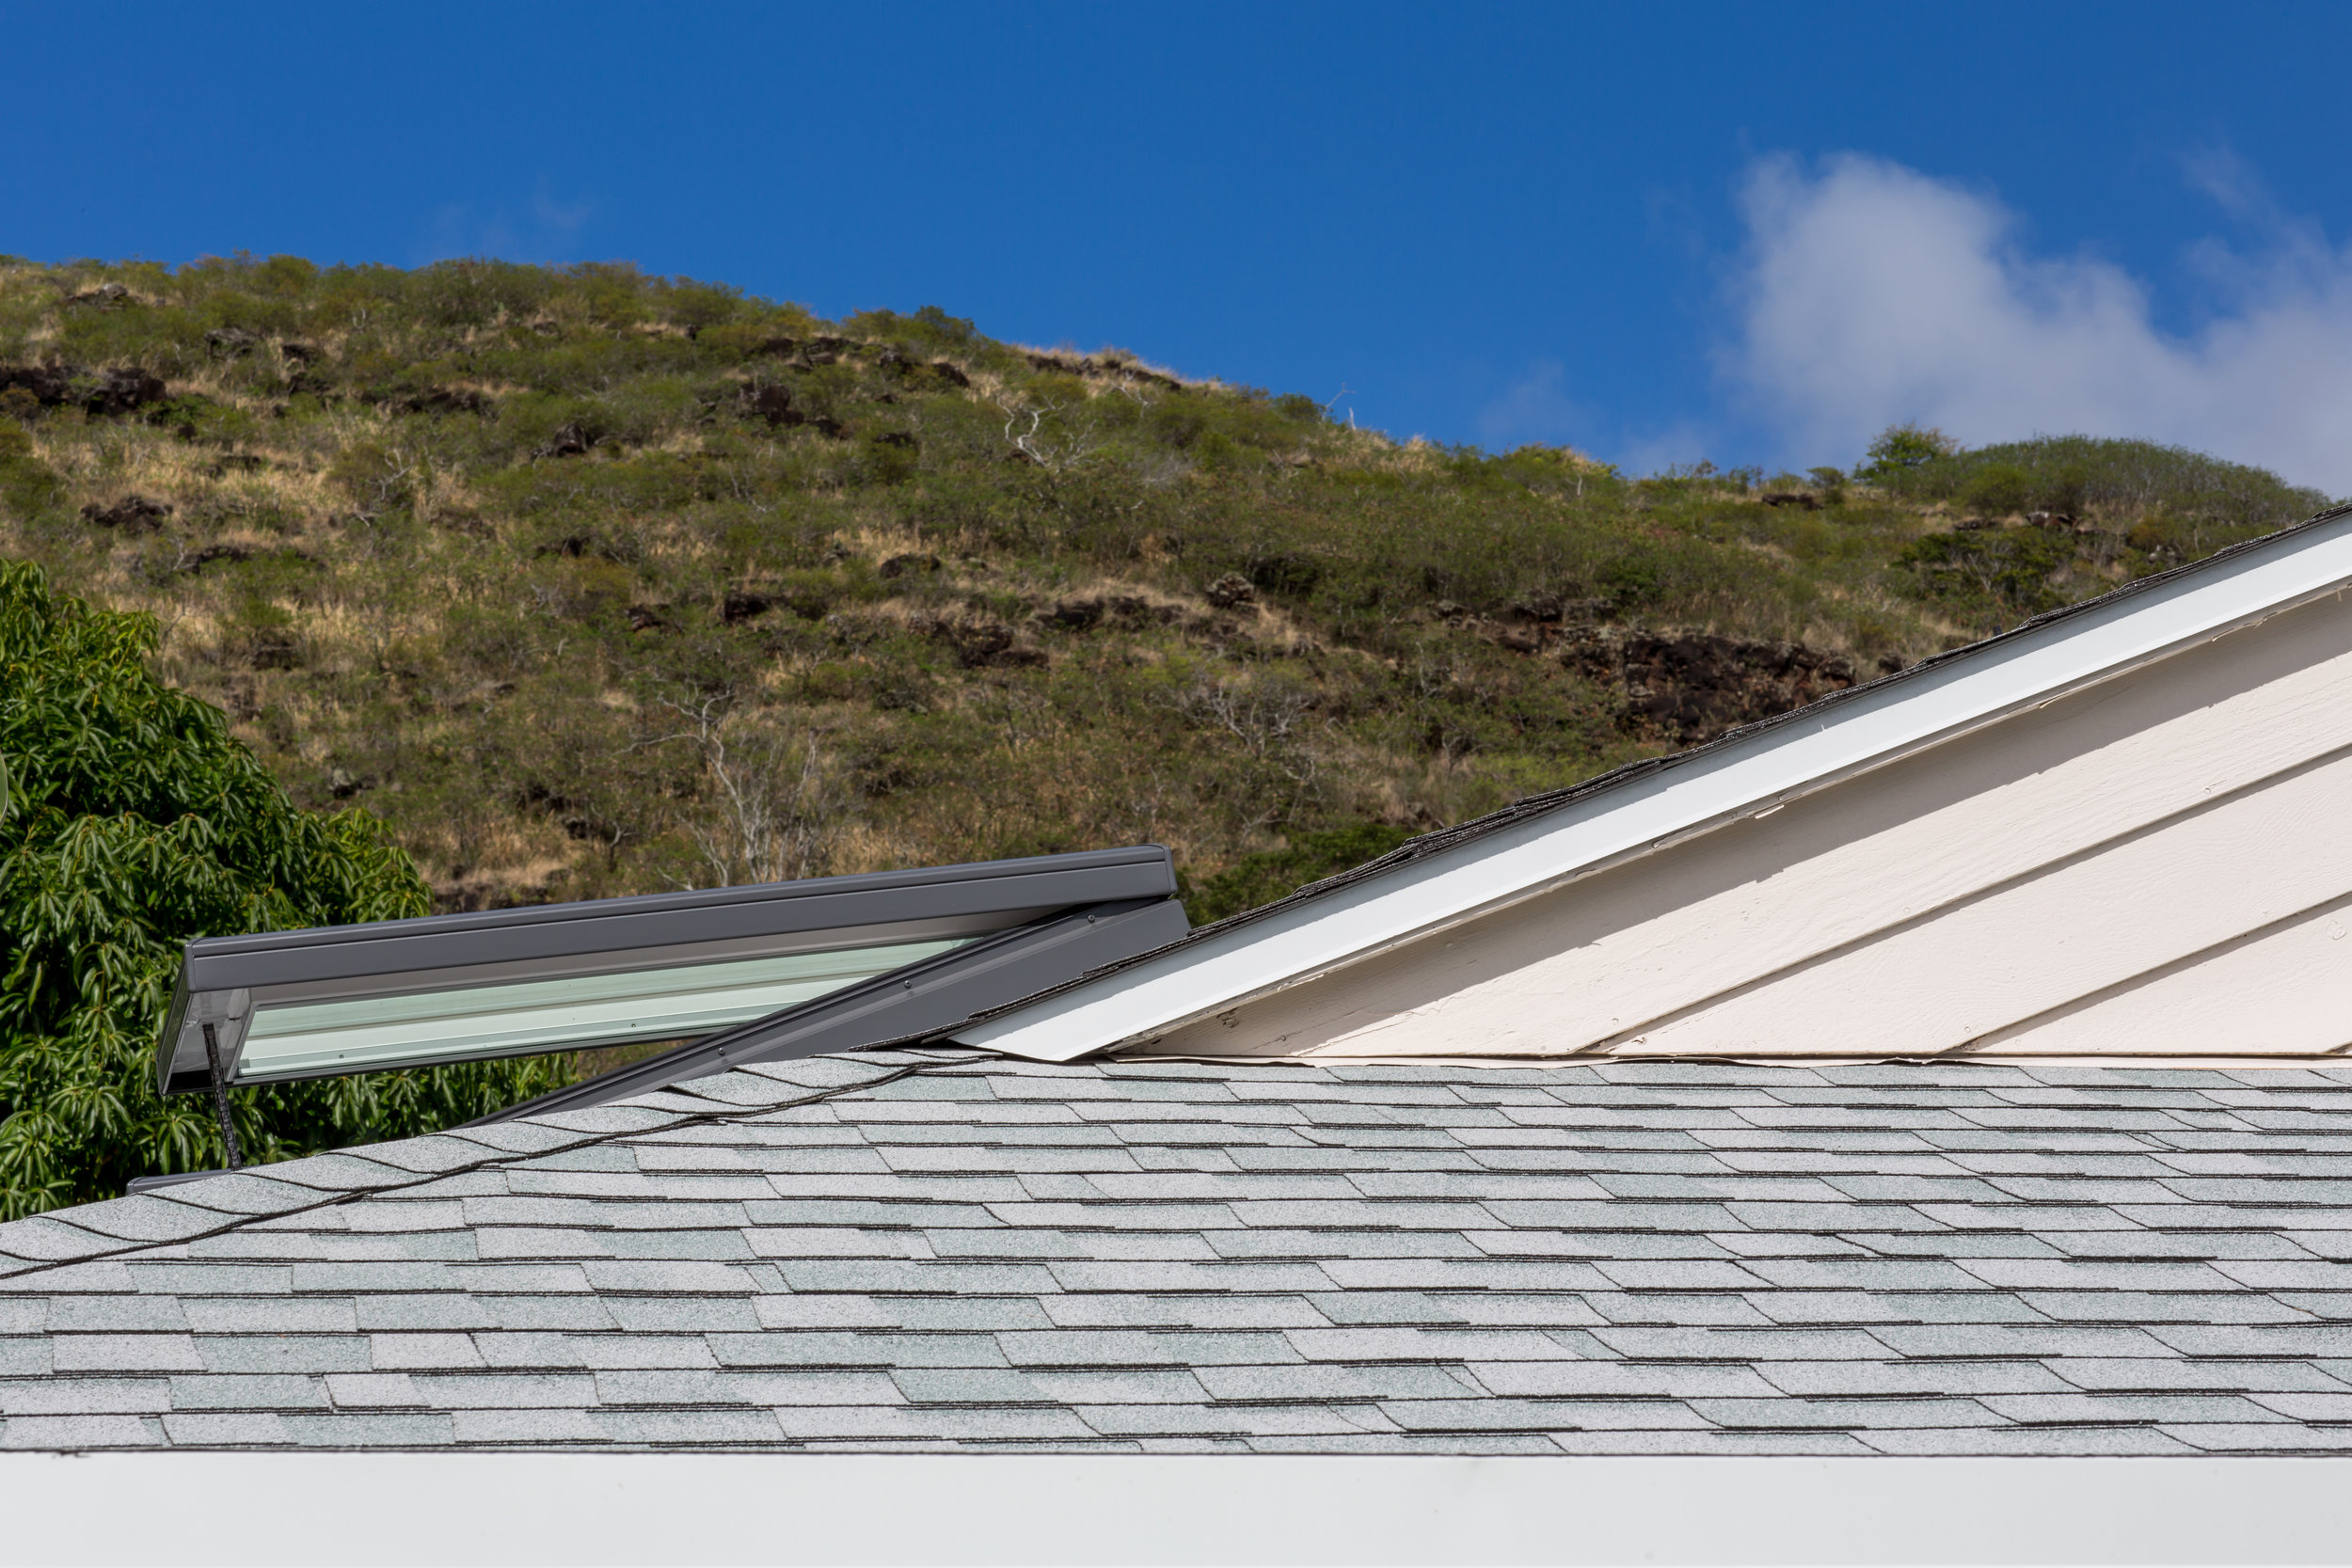 RevoluSun Smart Home Natural Sky Lighting